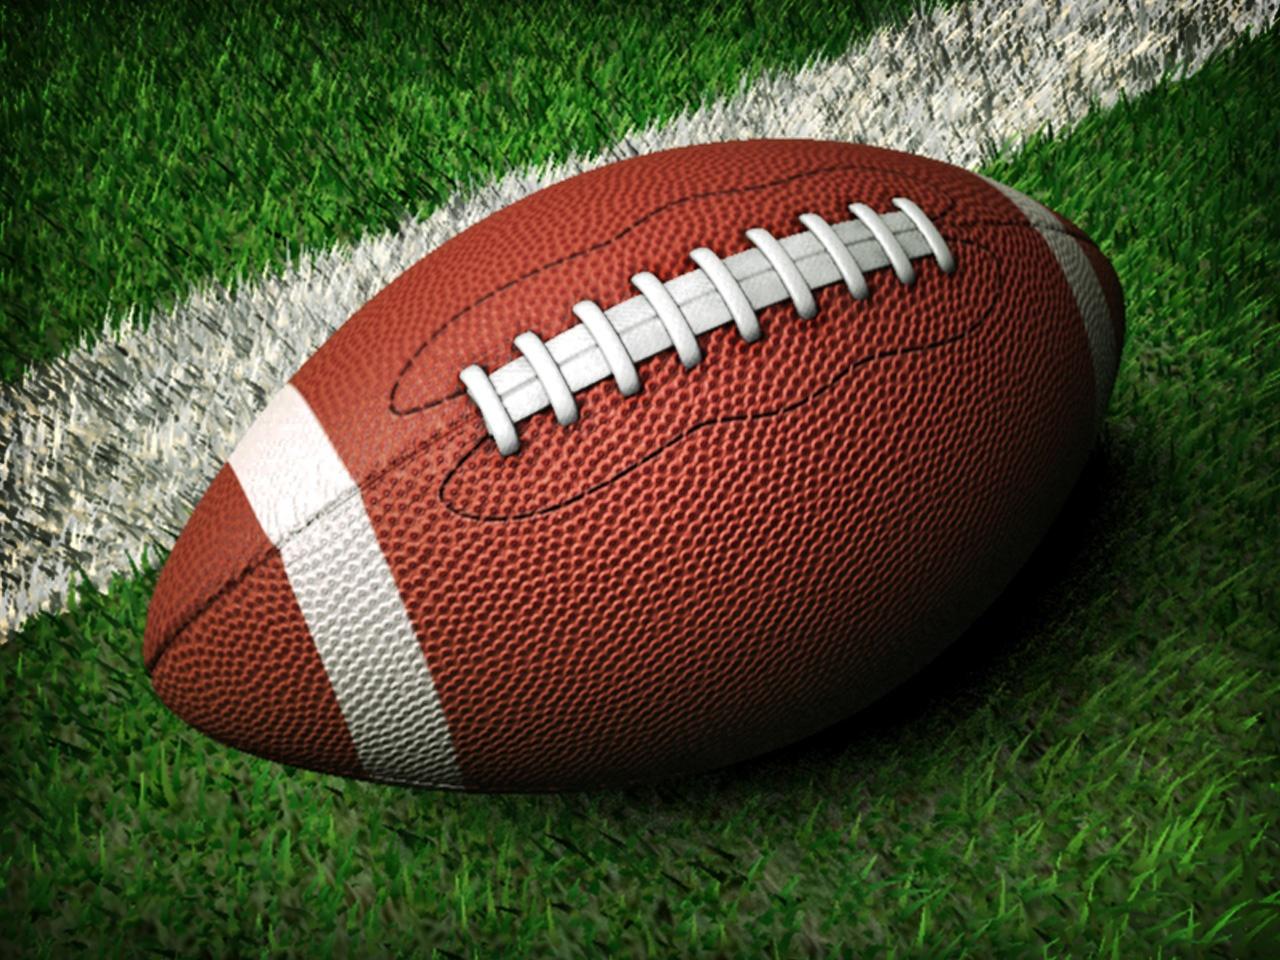 college football__1547250061452.jpg.jpg